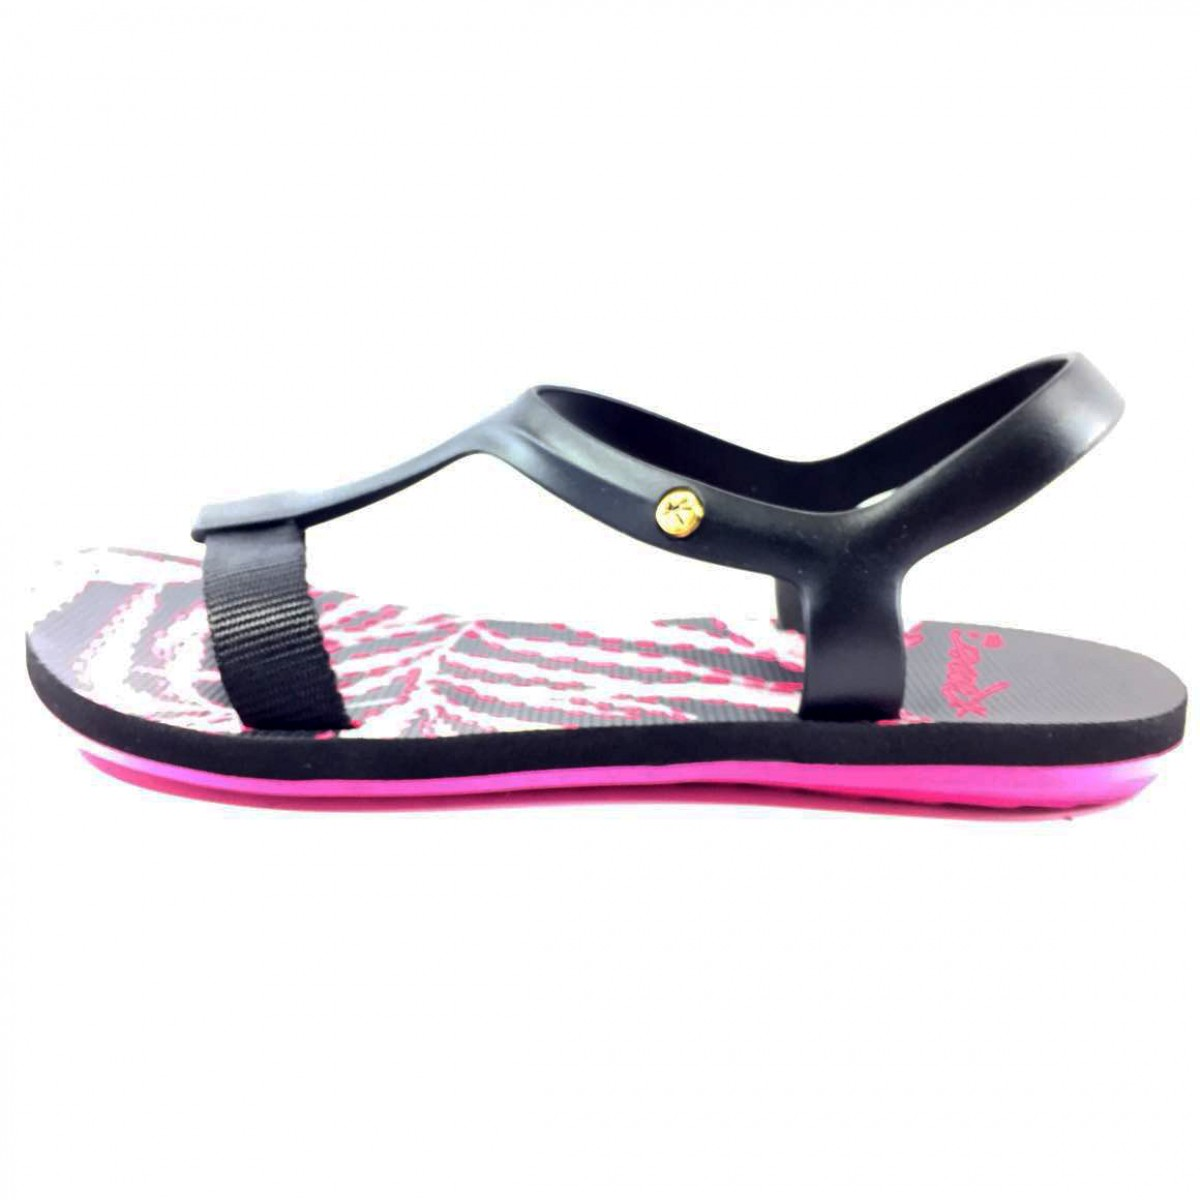 3ea9b62d8f Sandália Feminina Kenner Lips Wing Sandal Leaves Twp Preta - Compre ...